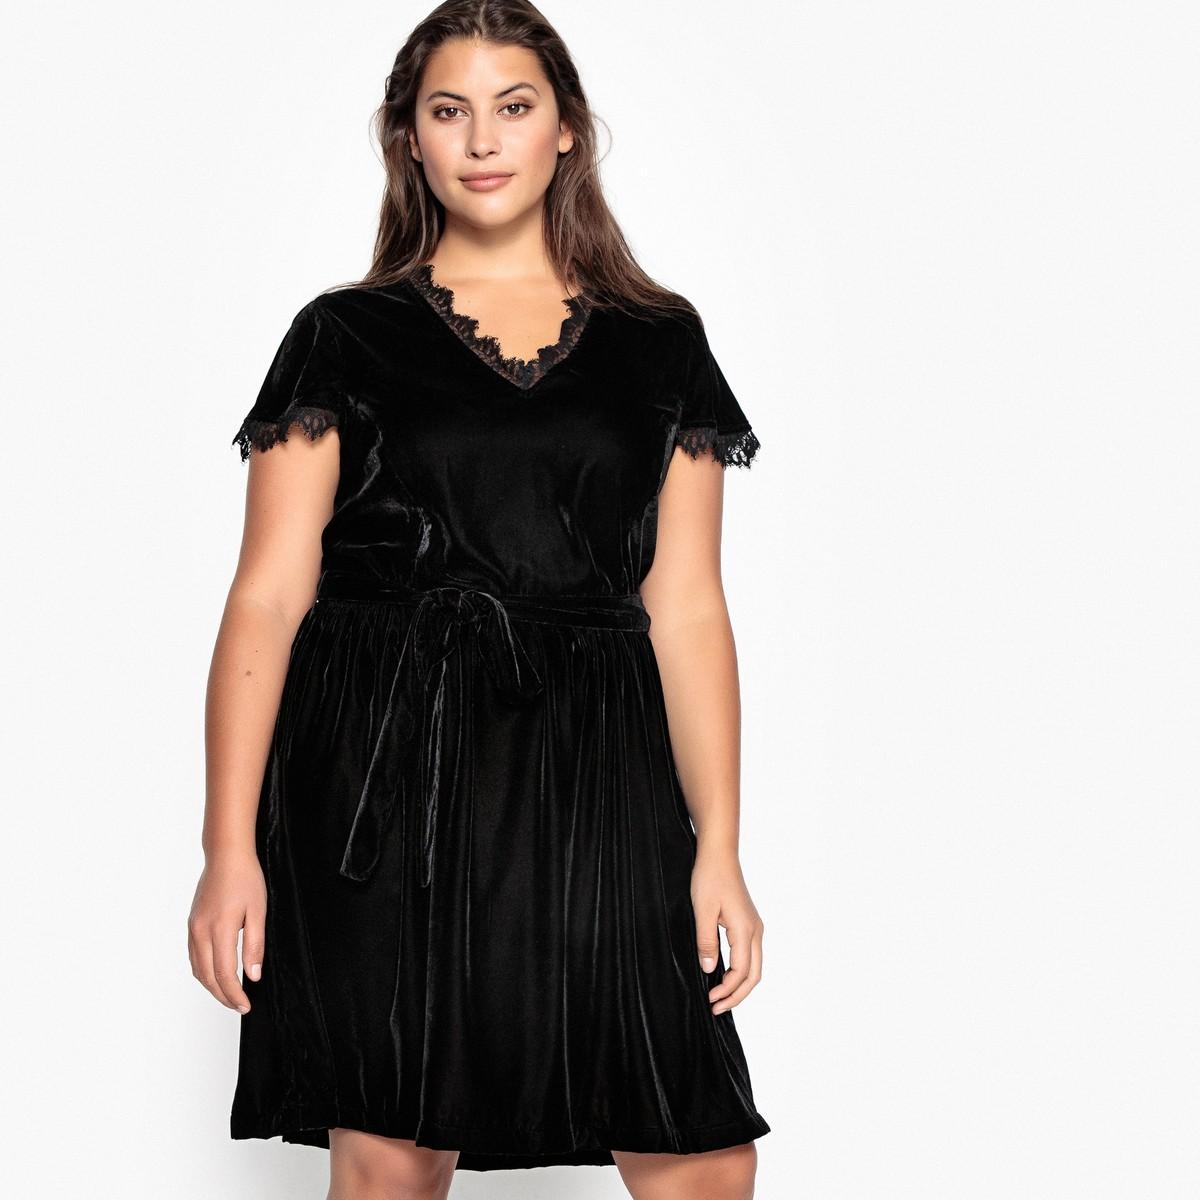 f1d0ab48a4a4 CASTALUNA Βελούδινο φόρεμα με δαντέλα - Glami.gr